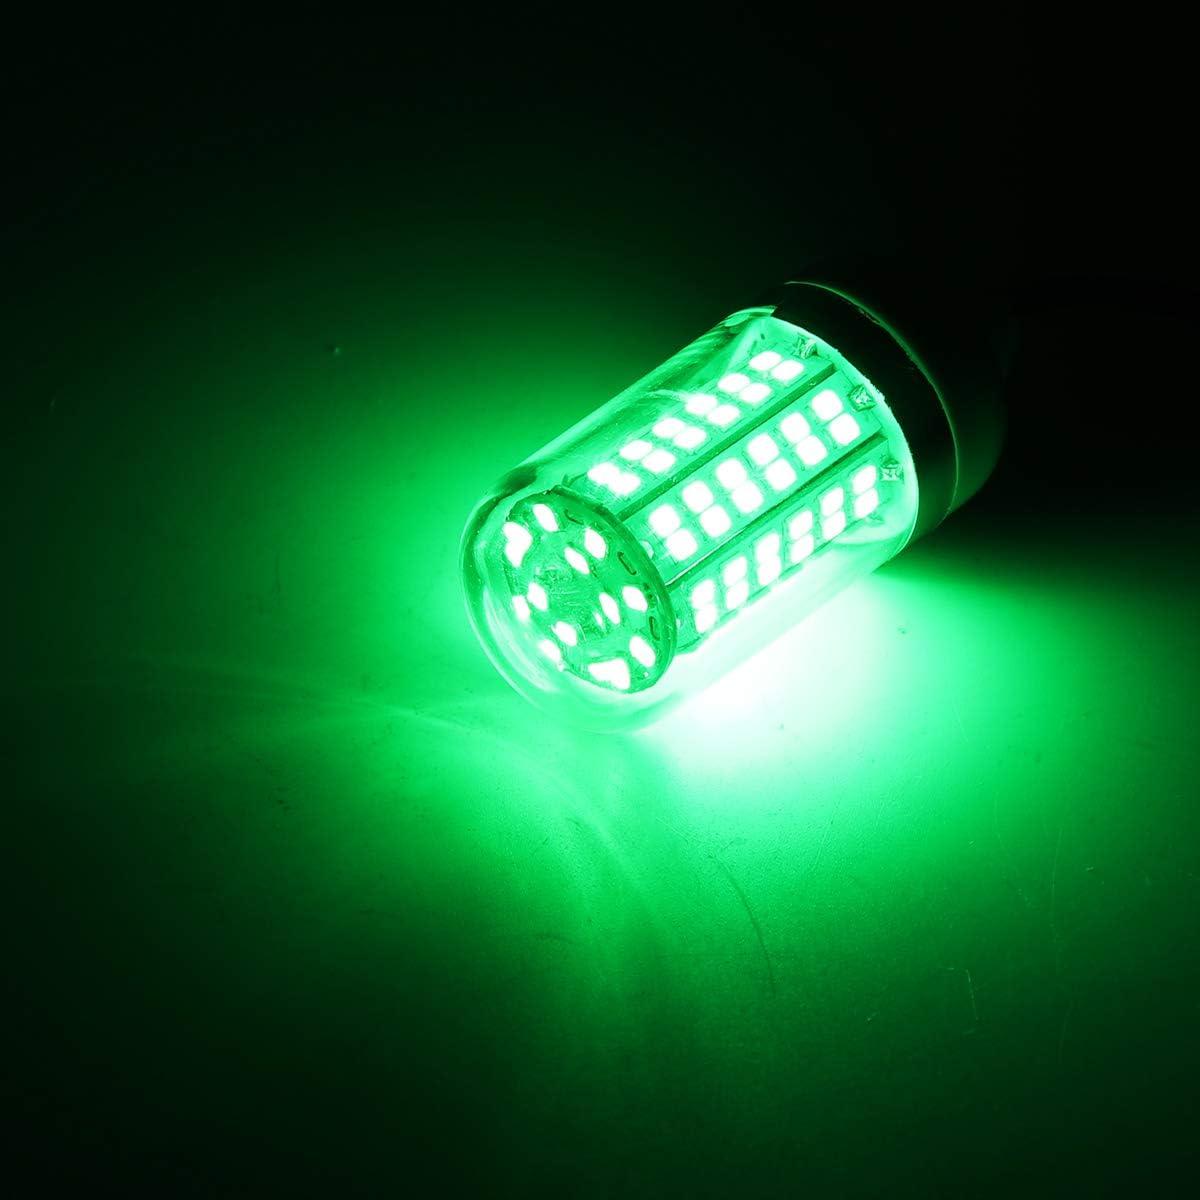 RTNLIT 12V 15W LED Fishing New Free Shipping Light 108 Under blast sales Finde Fish Underwater LEDs